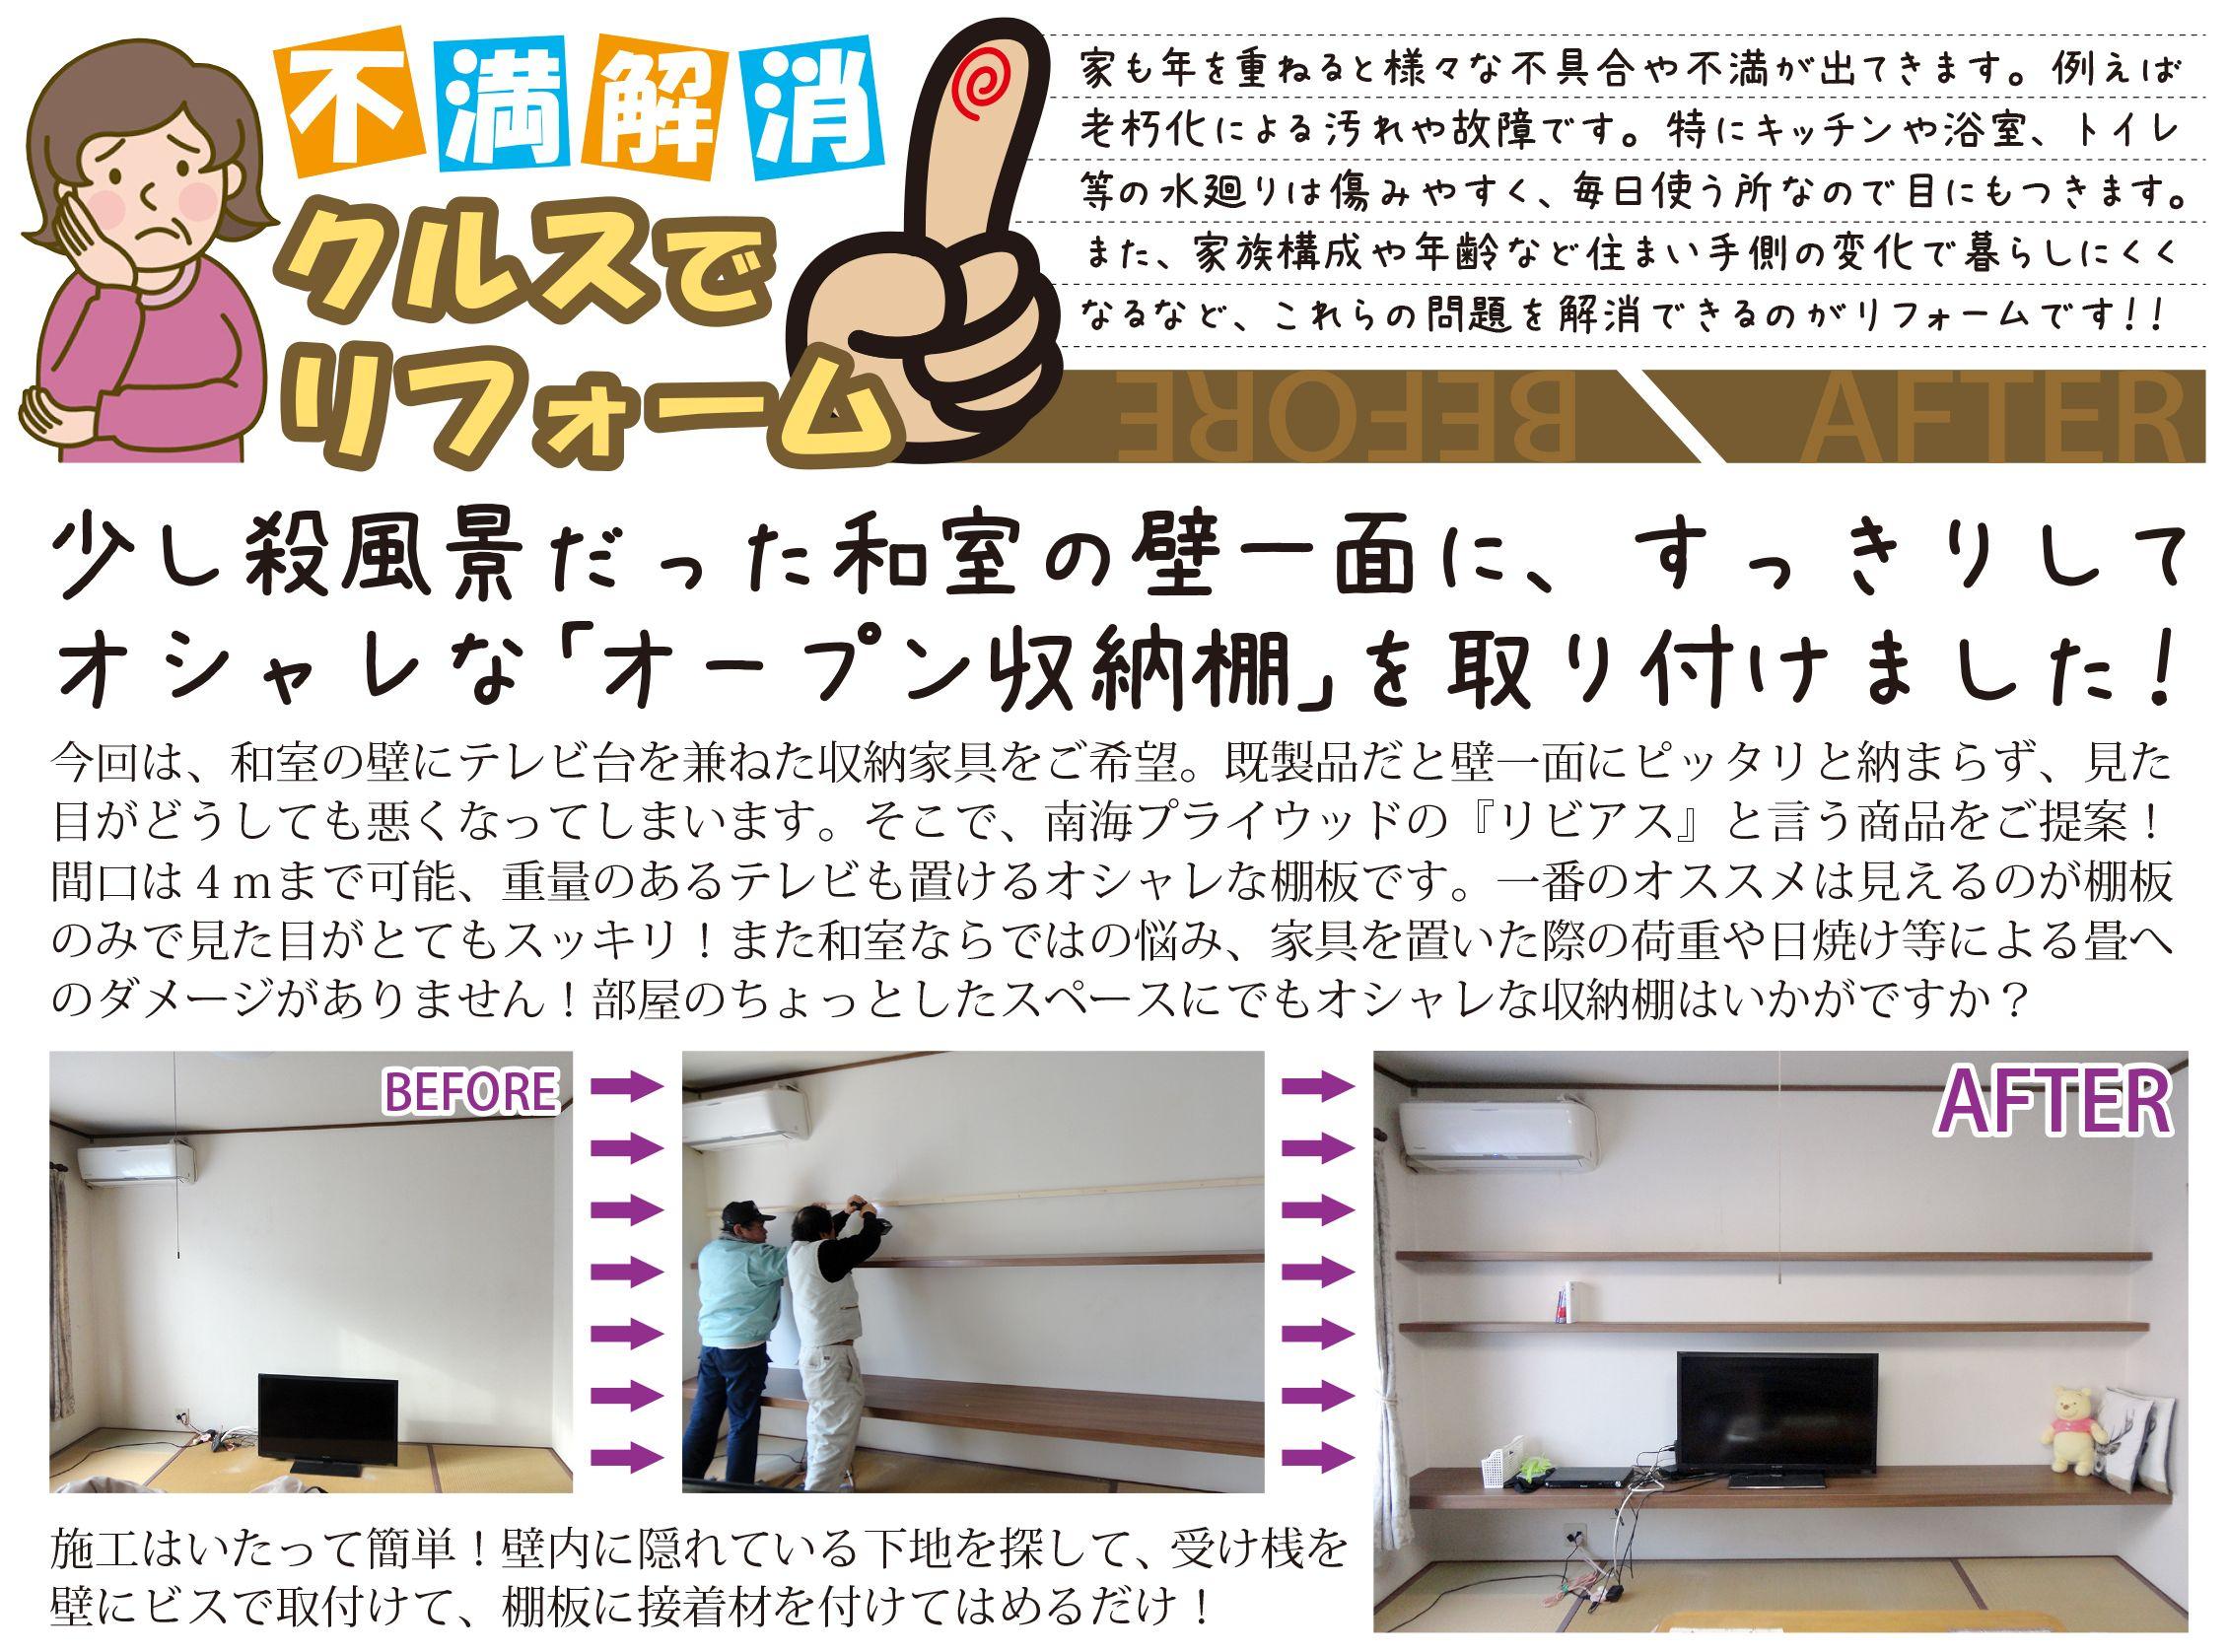 KuraSi-natu-sin99-12.jpg